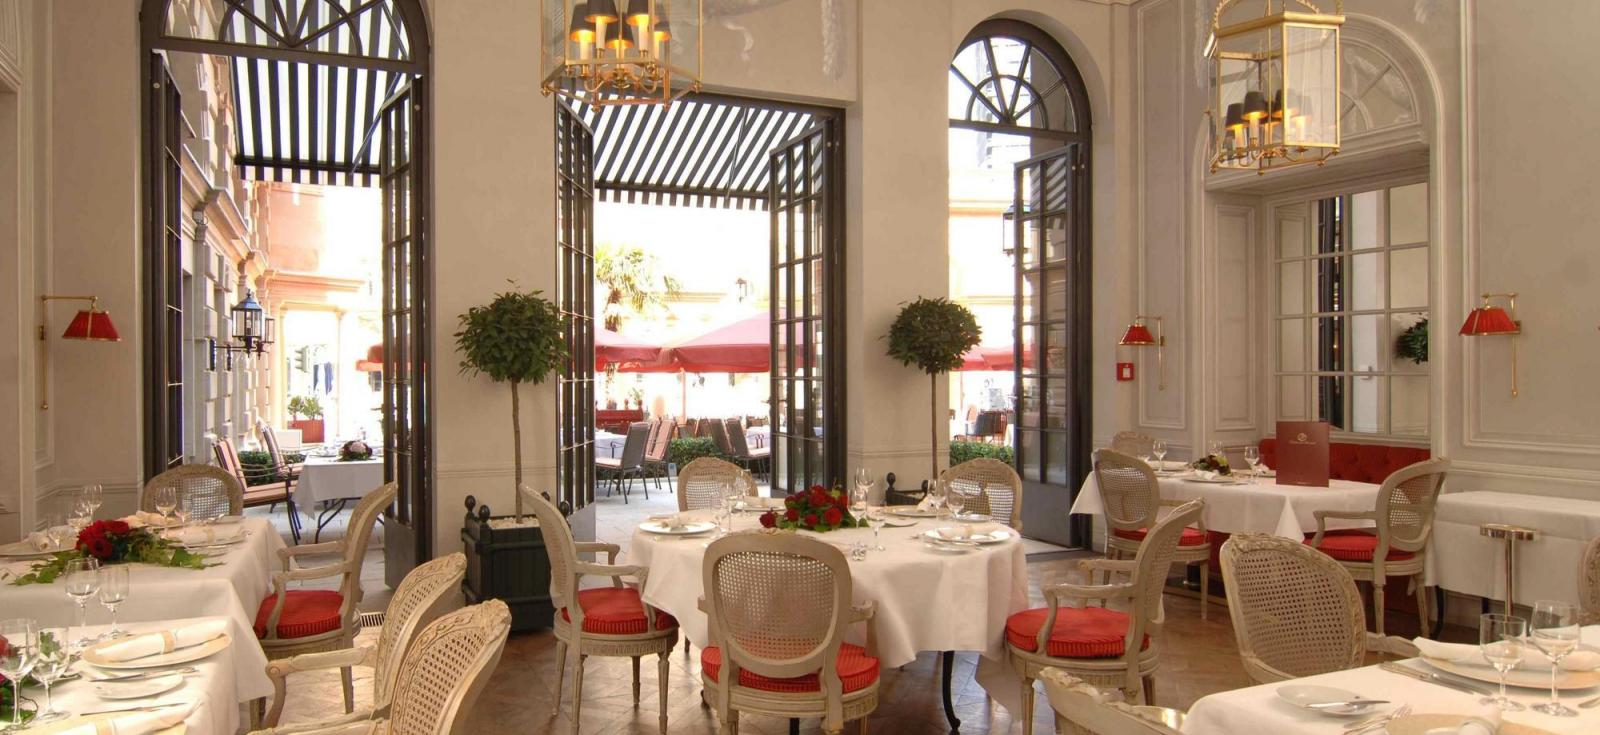 5 Amazing Luxury Hotels in Frankfurt 2018 5 Amazing Luxury Hotels in Frankfurt 2018 5 Amazing Luxury Hotels in Frankfurt 2018 283284305